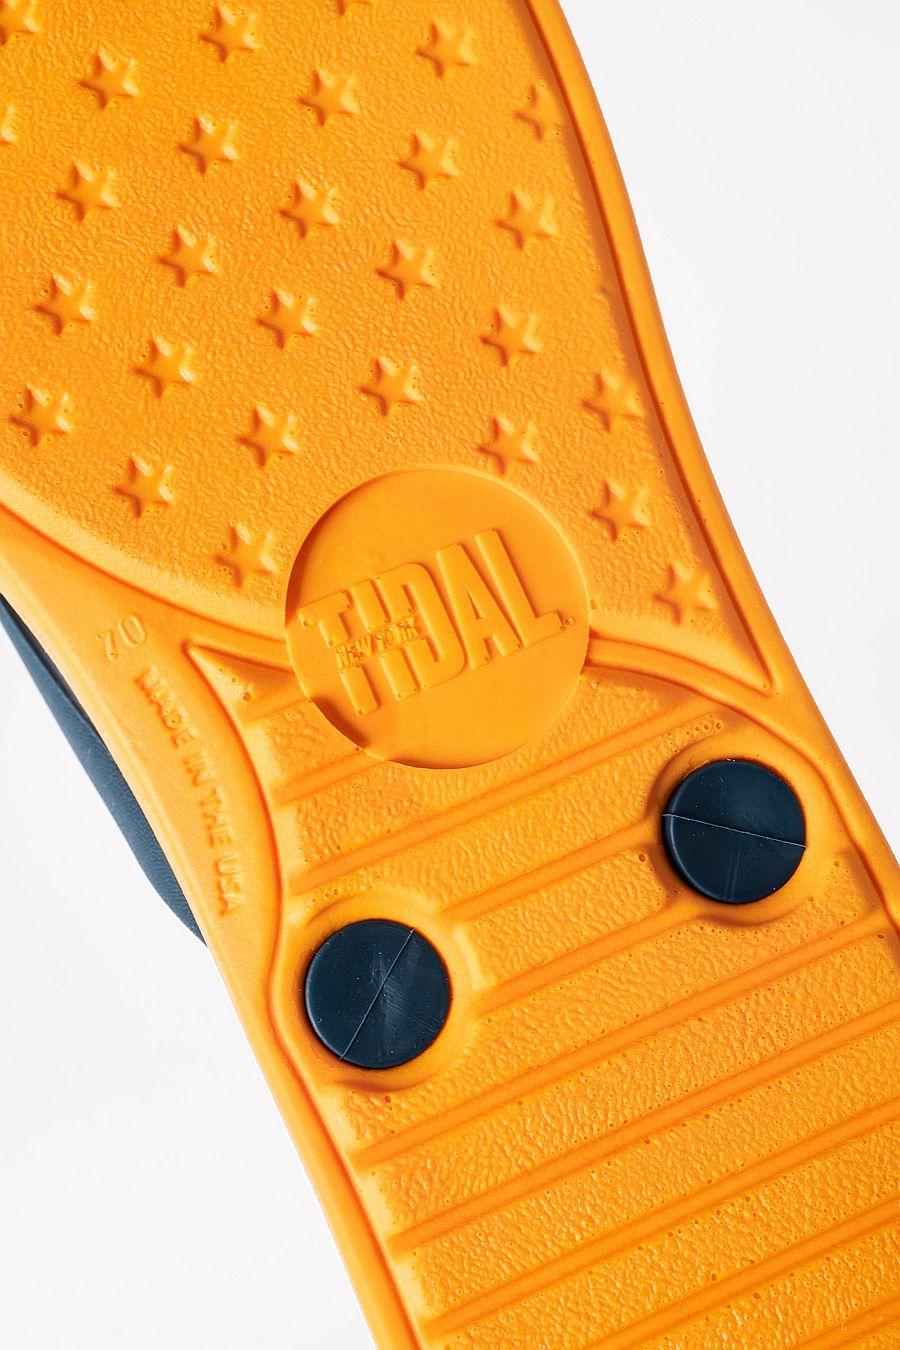 Tidal BUNGALOW Flip Flops - Tangerine/Washed Blue